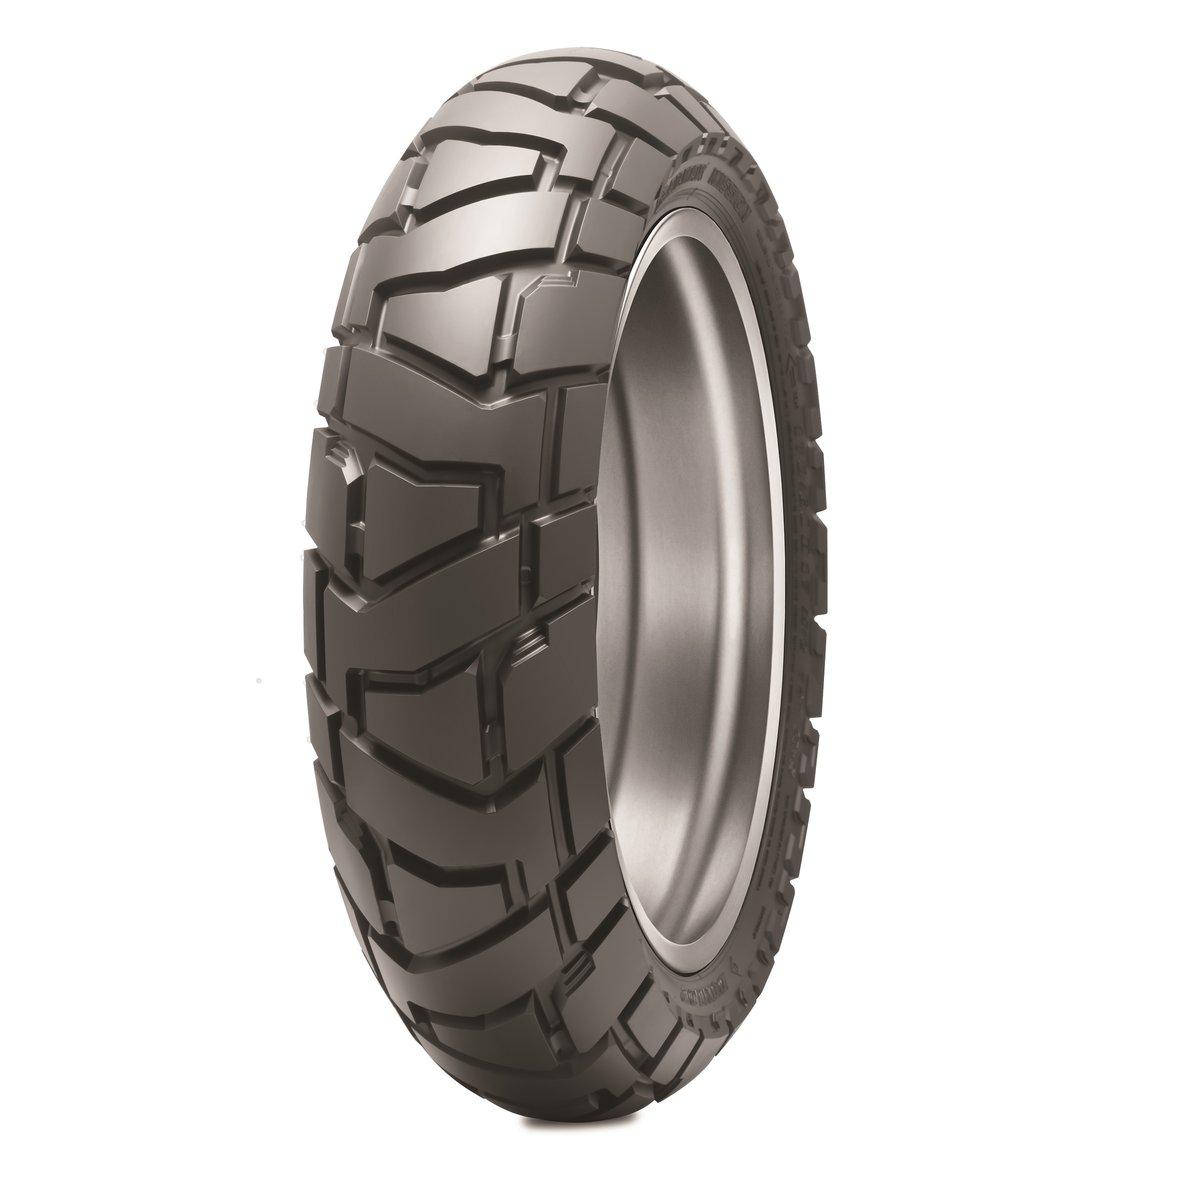 Dunlop Trailmax Mission zadná adventure pneumatika